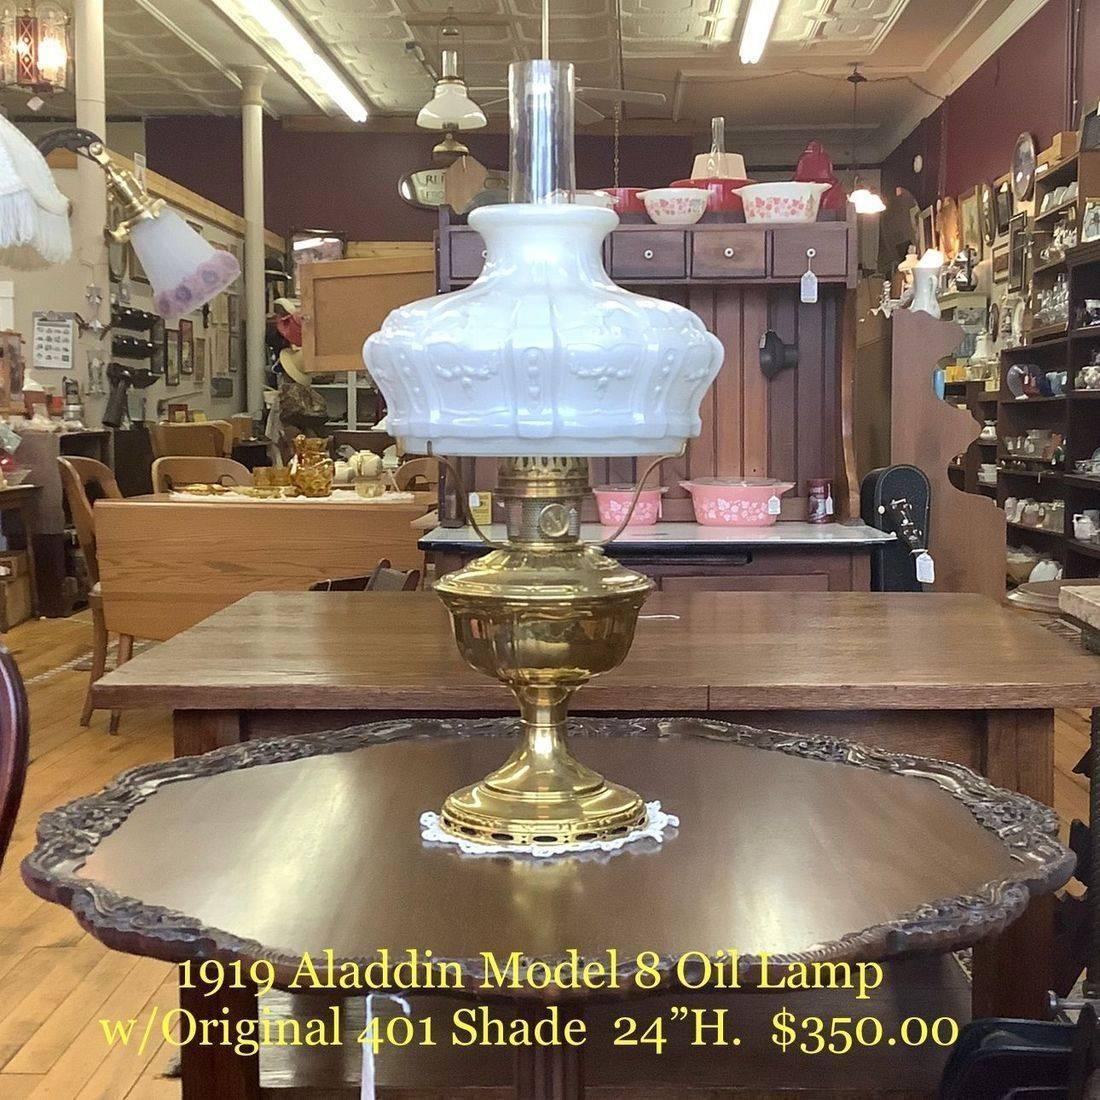 1919 Aladdin Model 8 Brass Oil Lamp w/New Wick, New Mantle, Original 401 Shade and 3- Line Heeless Chimney   $350.00